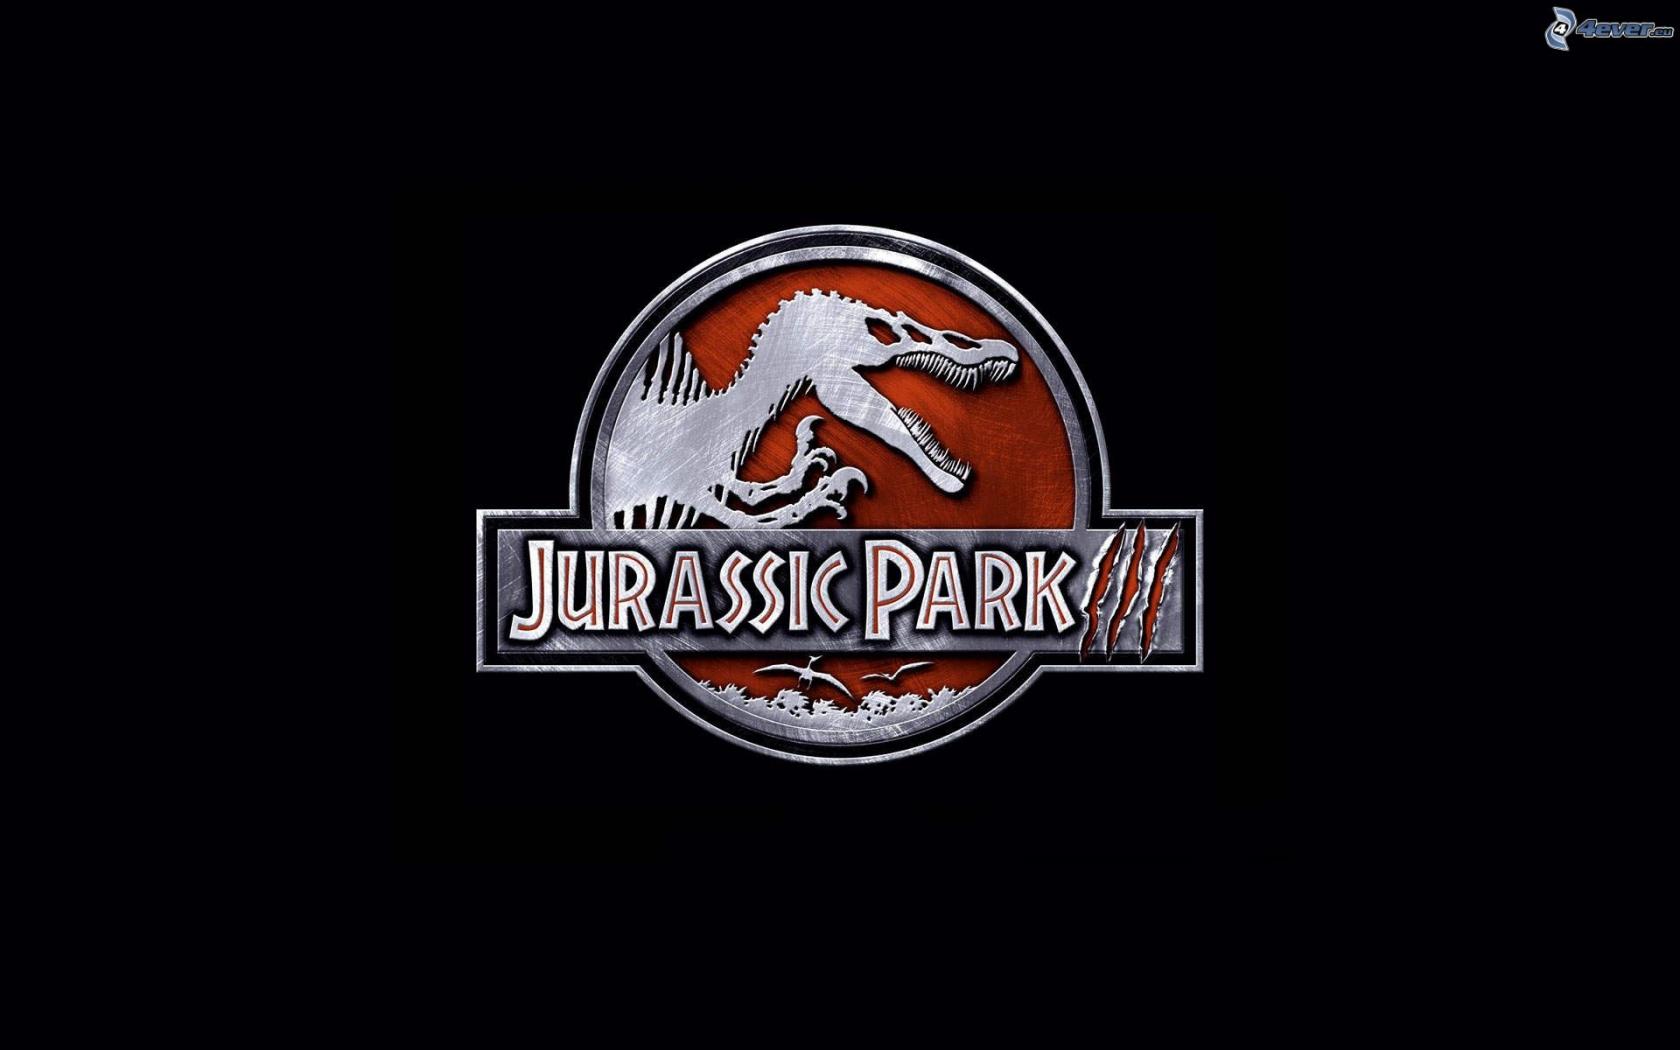 jurassic park logo - HD1680×1050